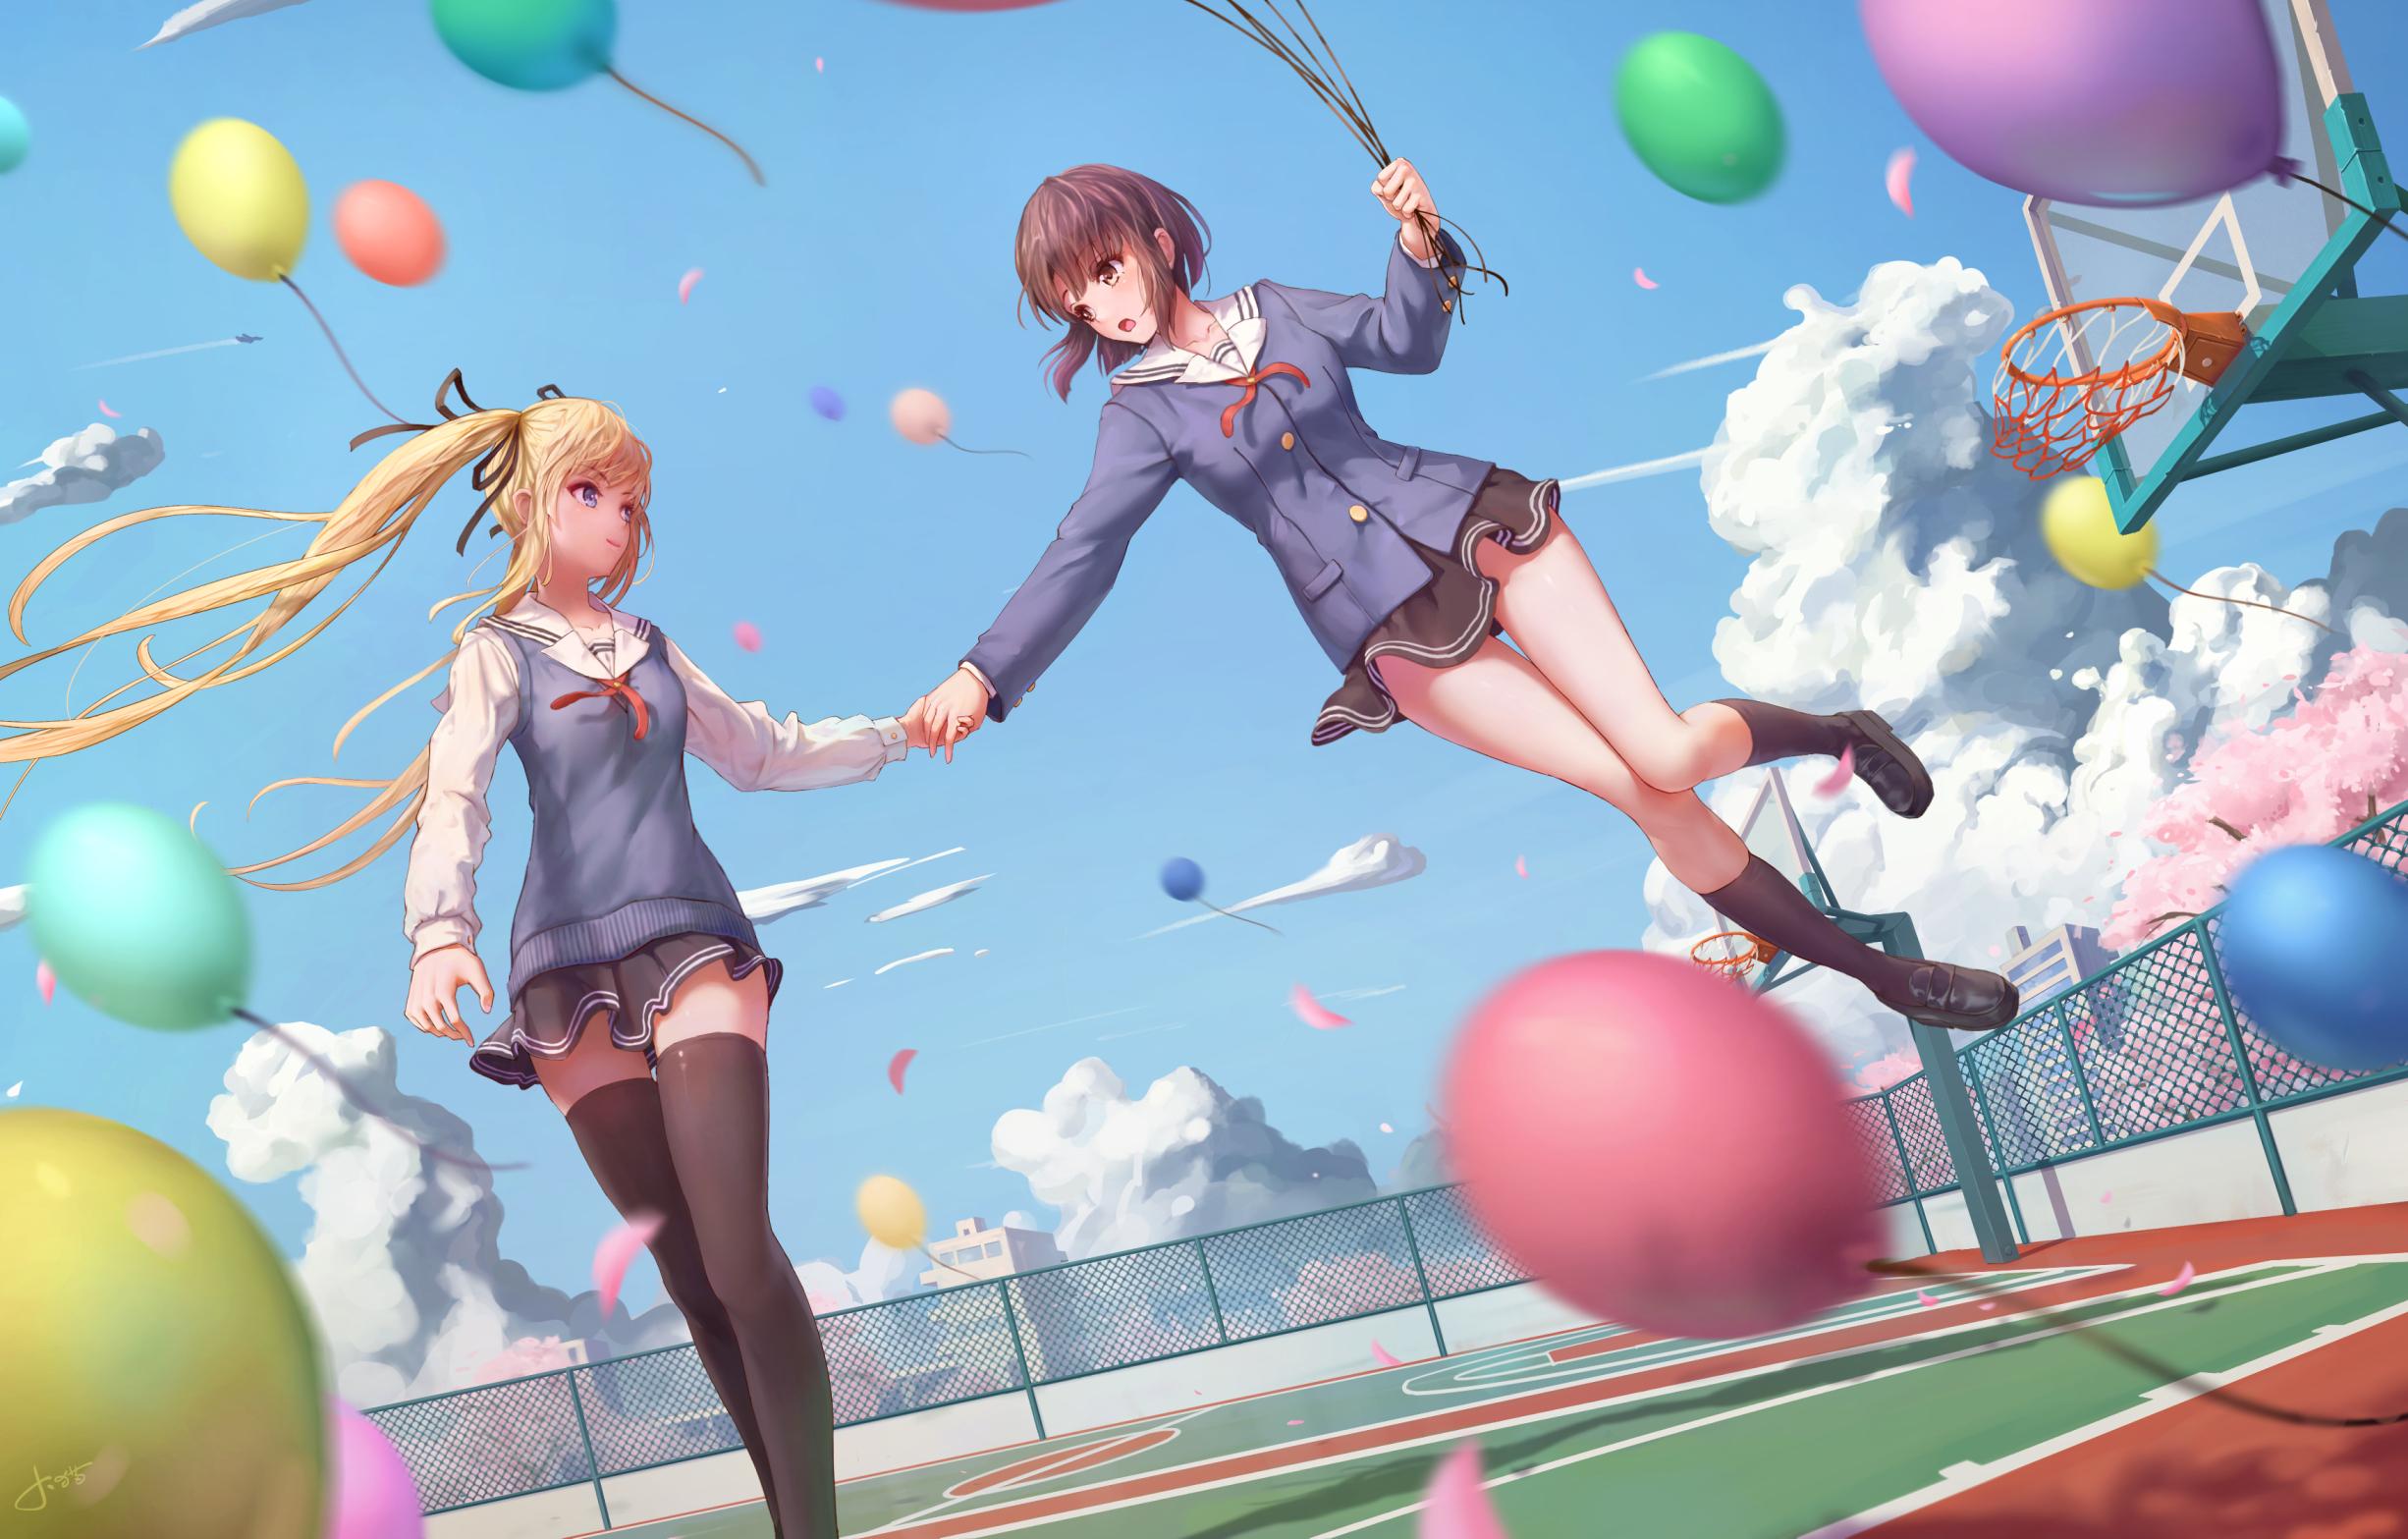 Saenai Heroine No Sodatekata Anime Girls Sawamura Eriri Spencer Katou Megumi Thigh Highs Jay Xu 2452x1567